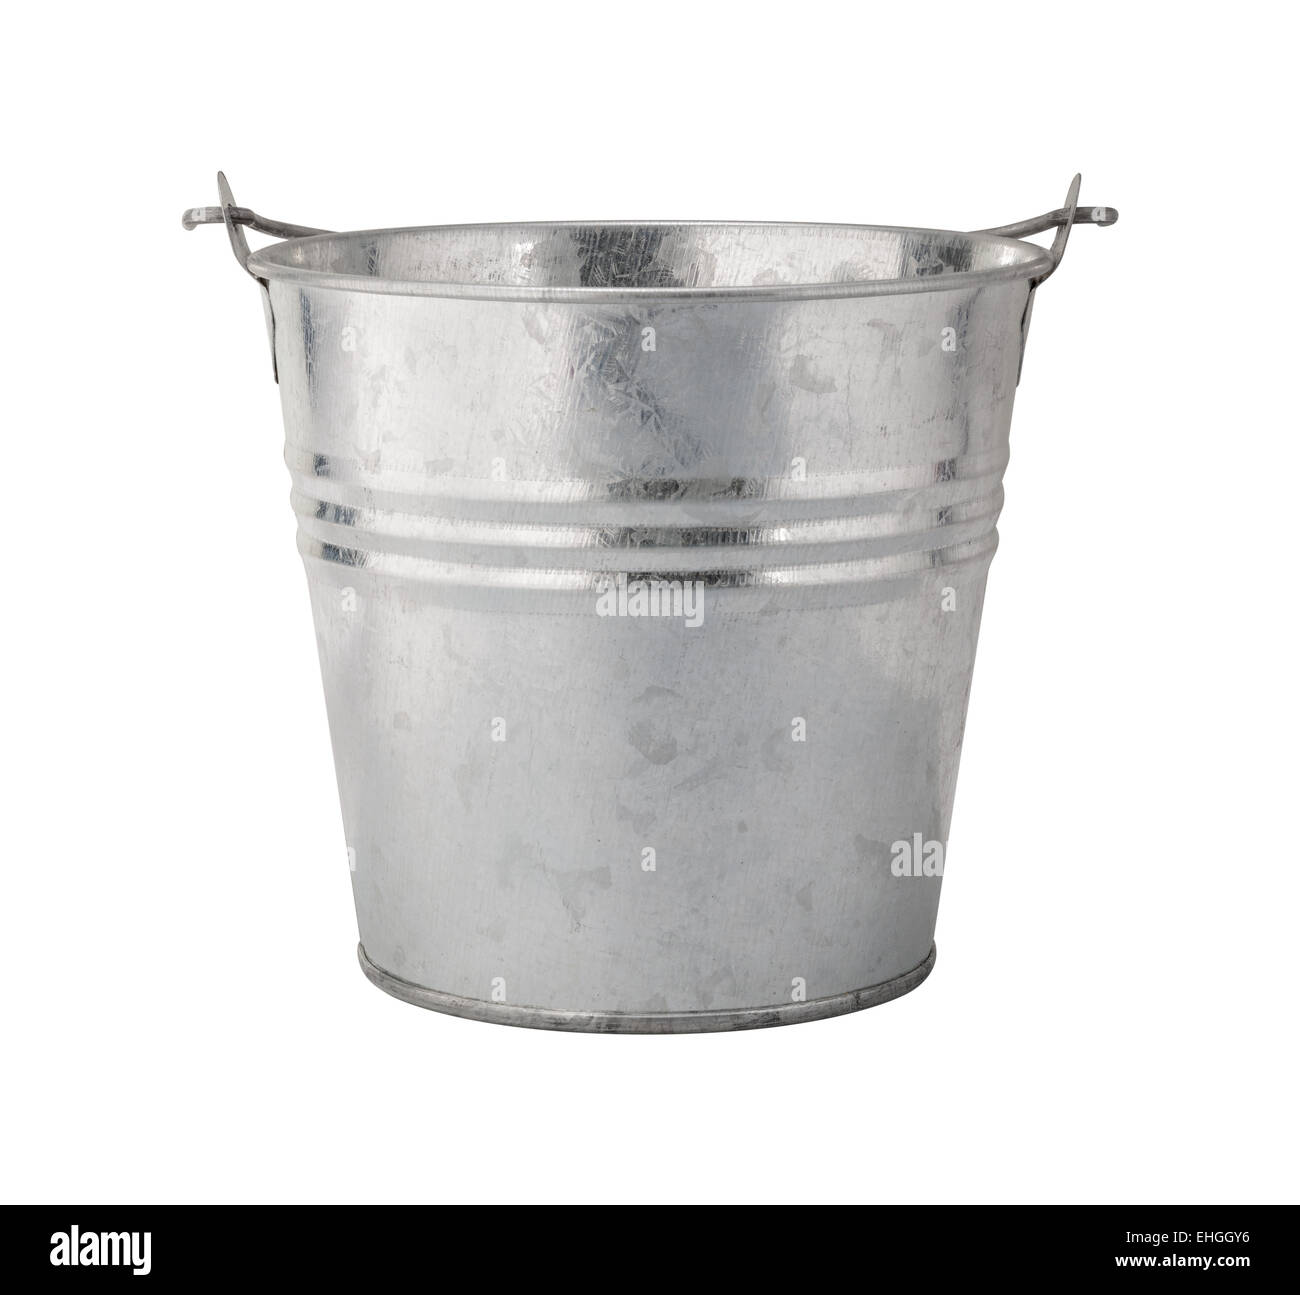 Metall-Eimer isoliert auf weiss Stockbild